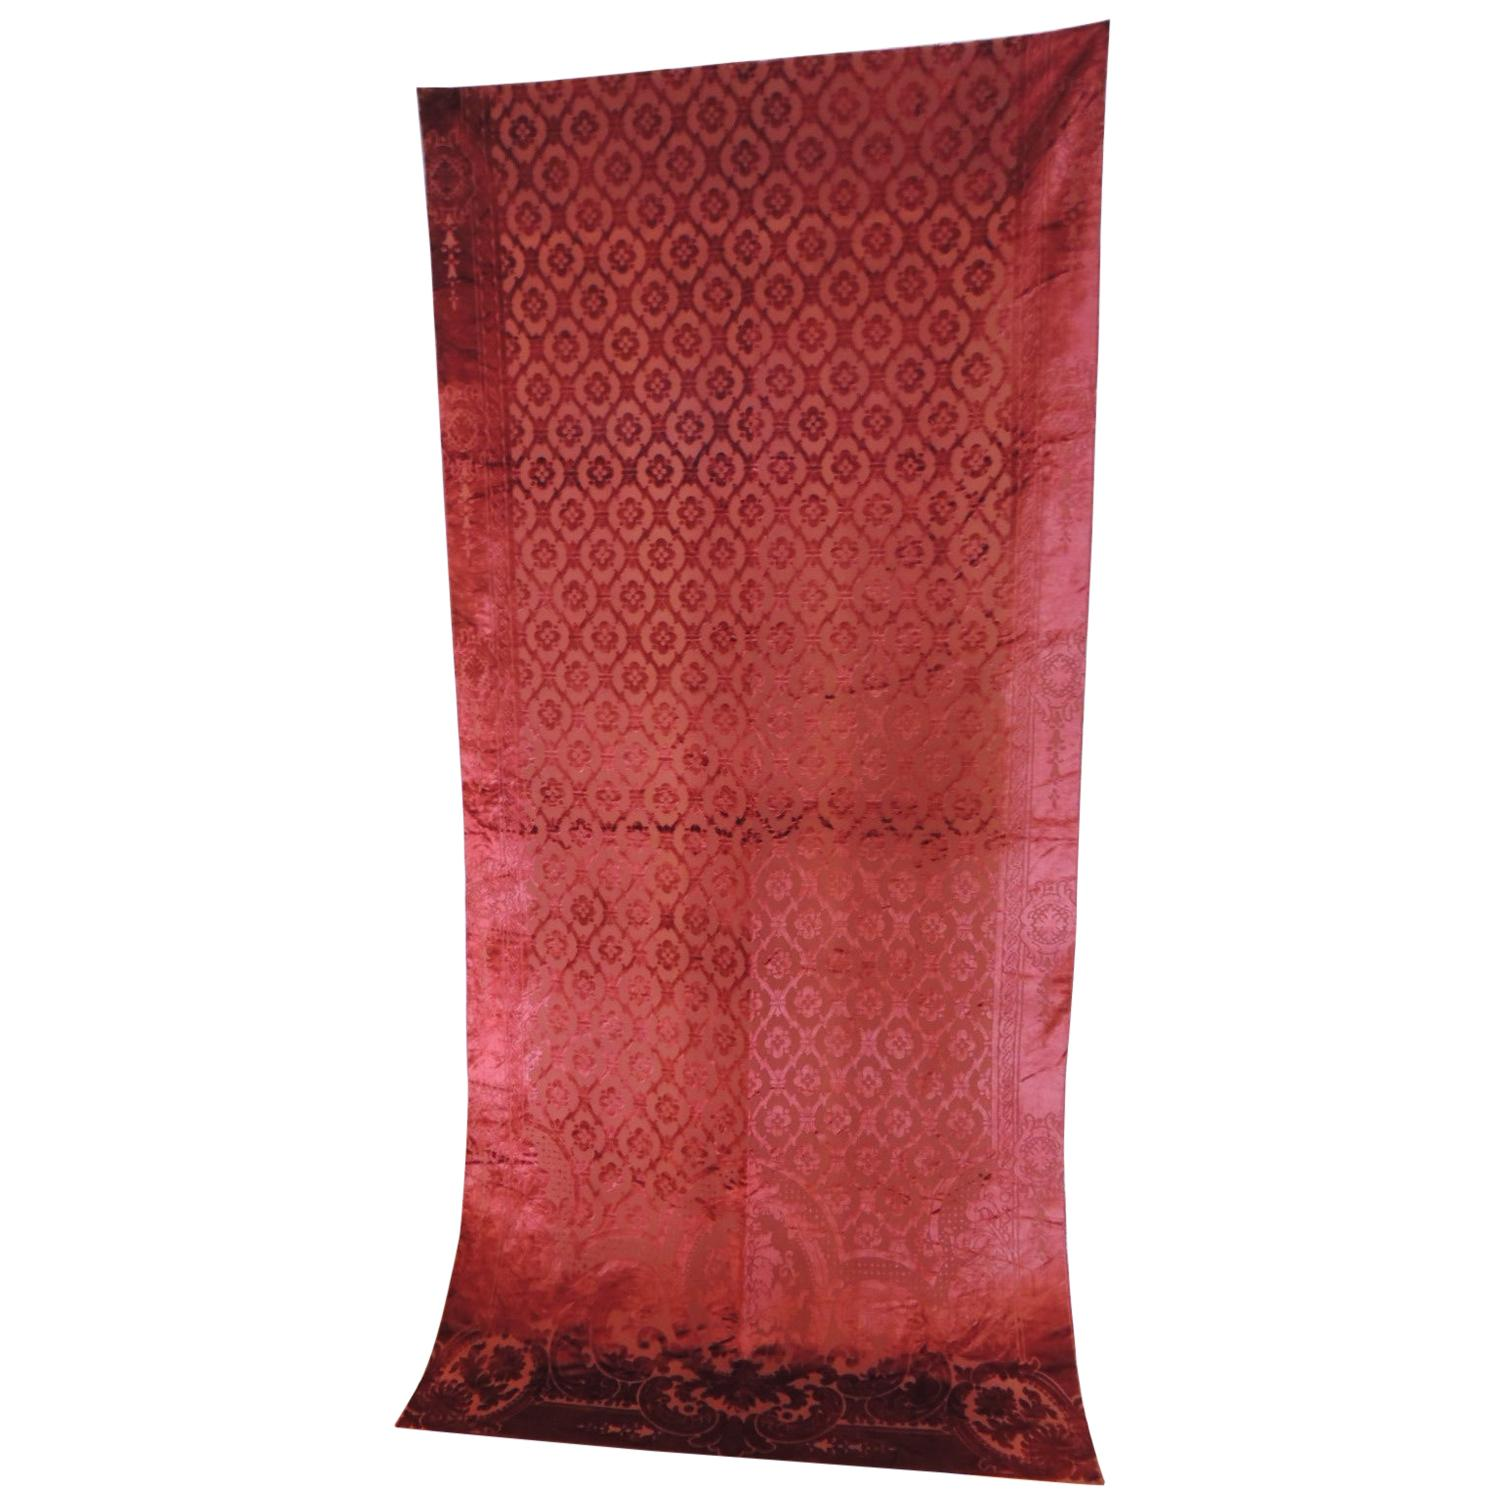 Antique French Red Silk Velvet Gaufrage Drapery Panel